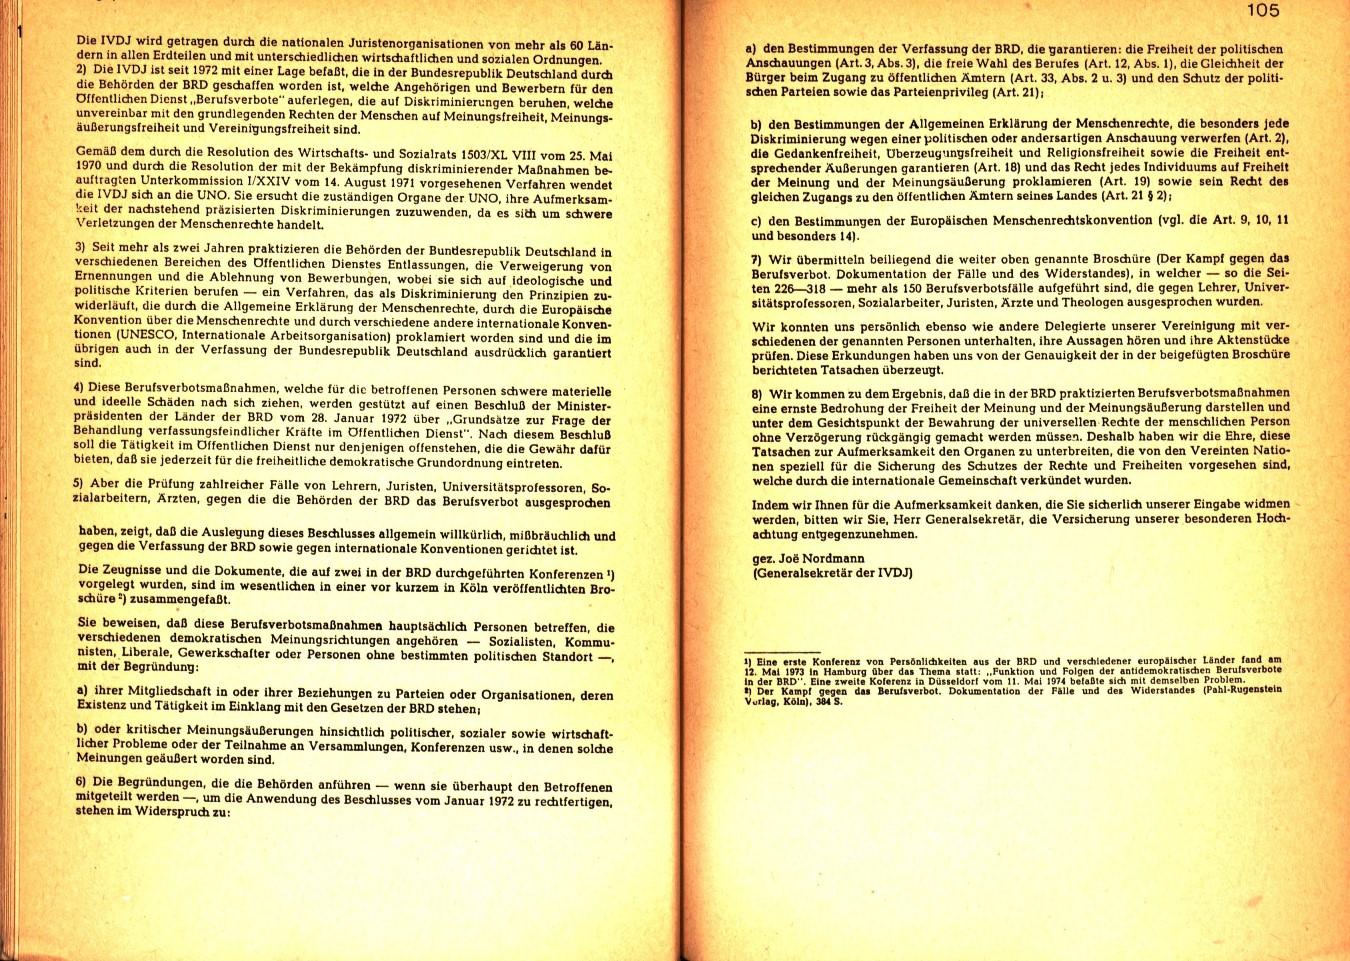 Berlin_VDS_Aktionskomitee_1975_BerufsverboteII_54